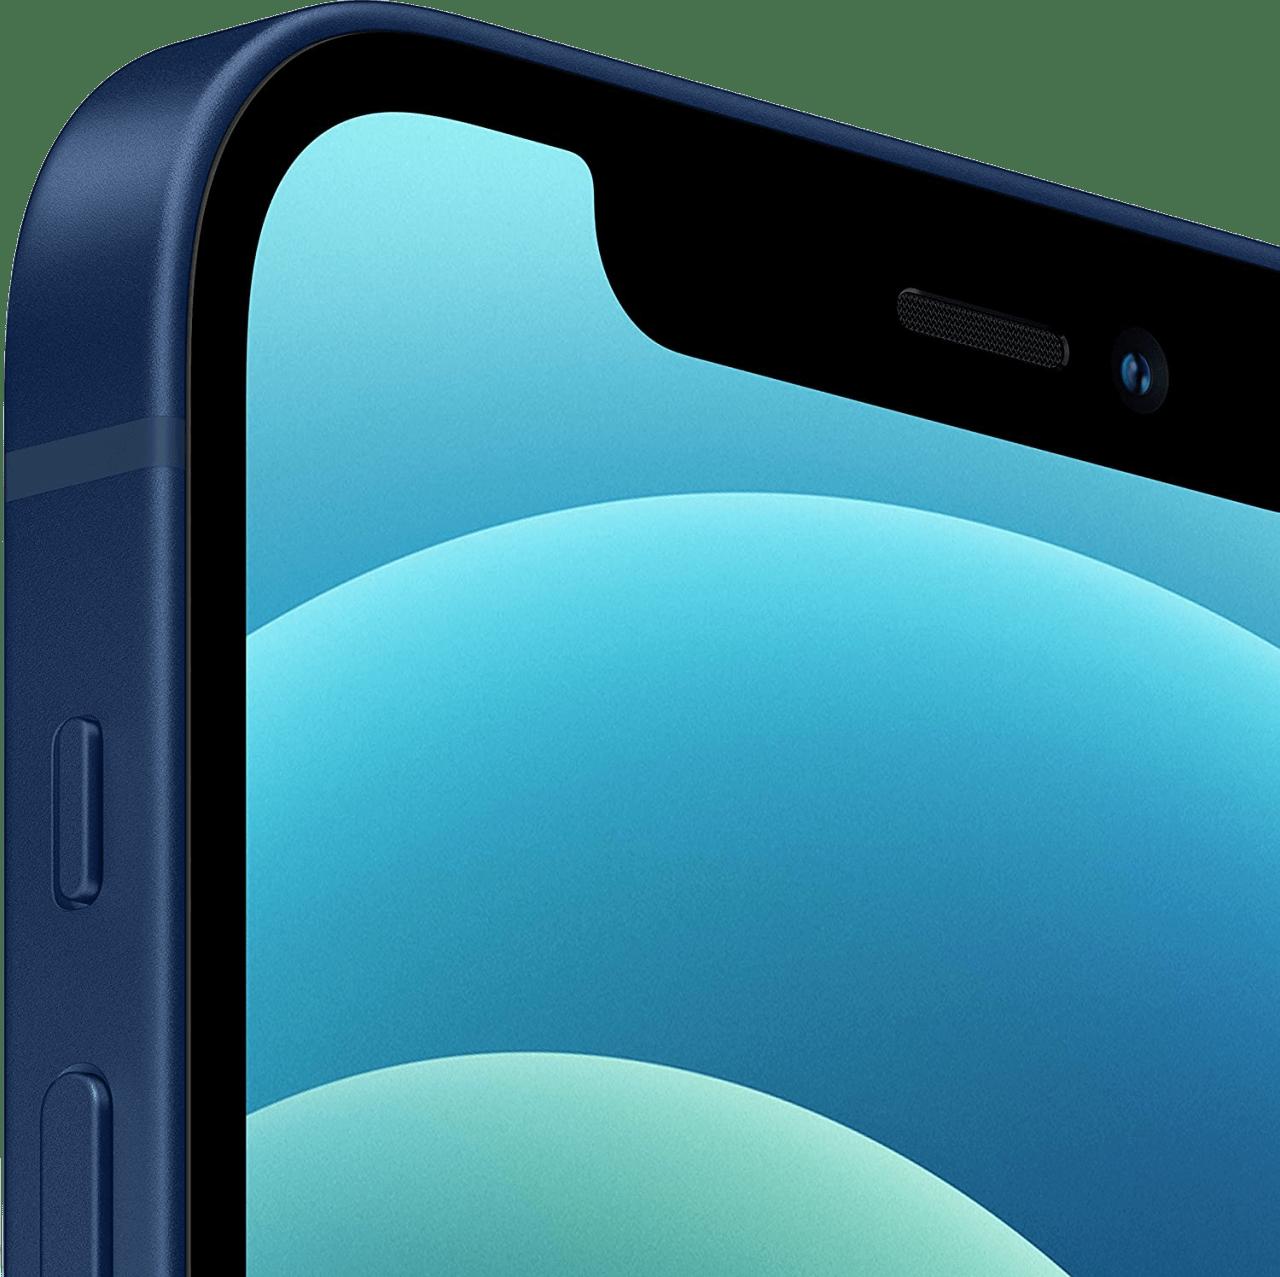 Blau Apple iPhone 12 mini 64GB.3